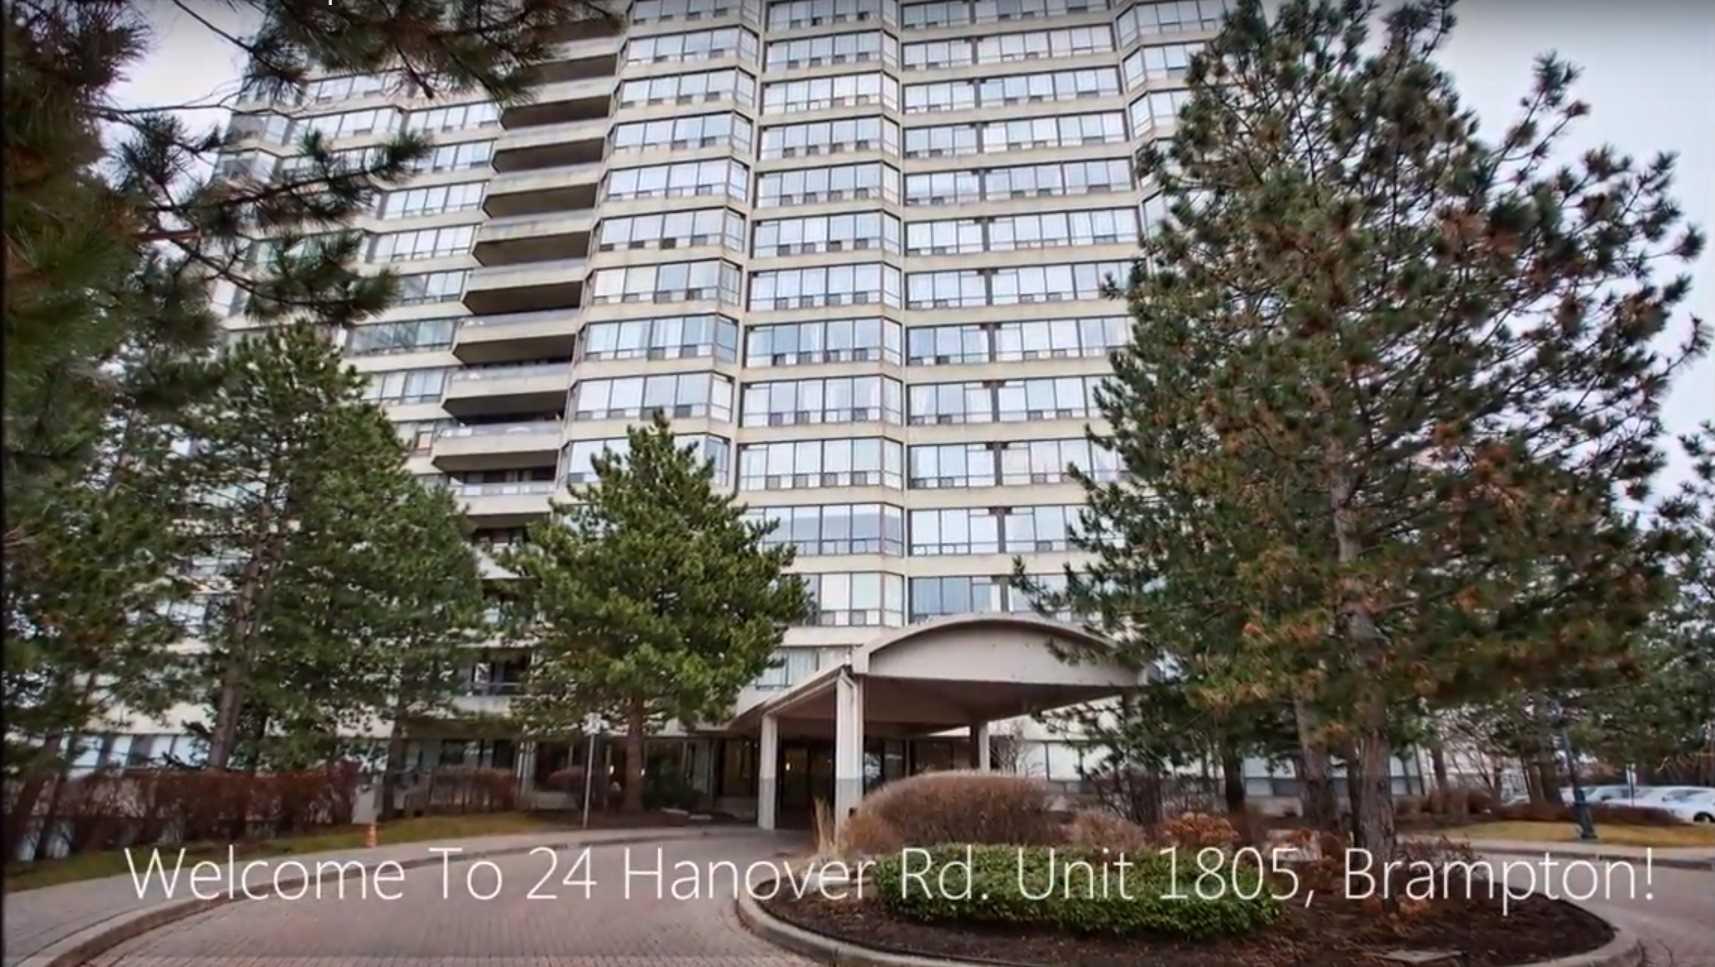 House for sale at 1805-24 Hanover Road Brampton Ontario - MLS: W4309368